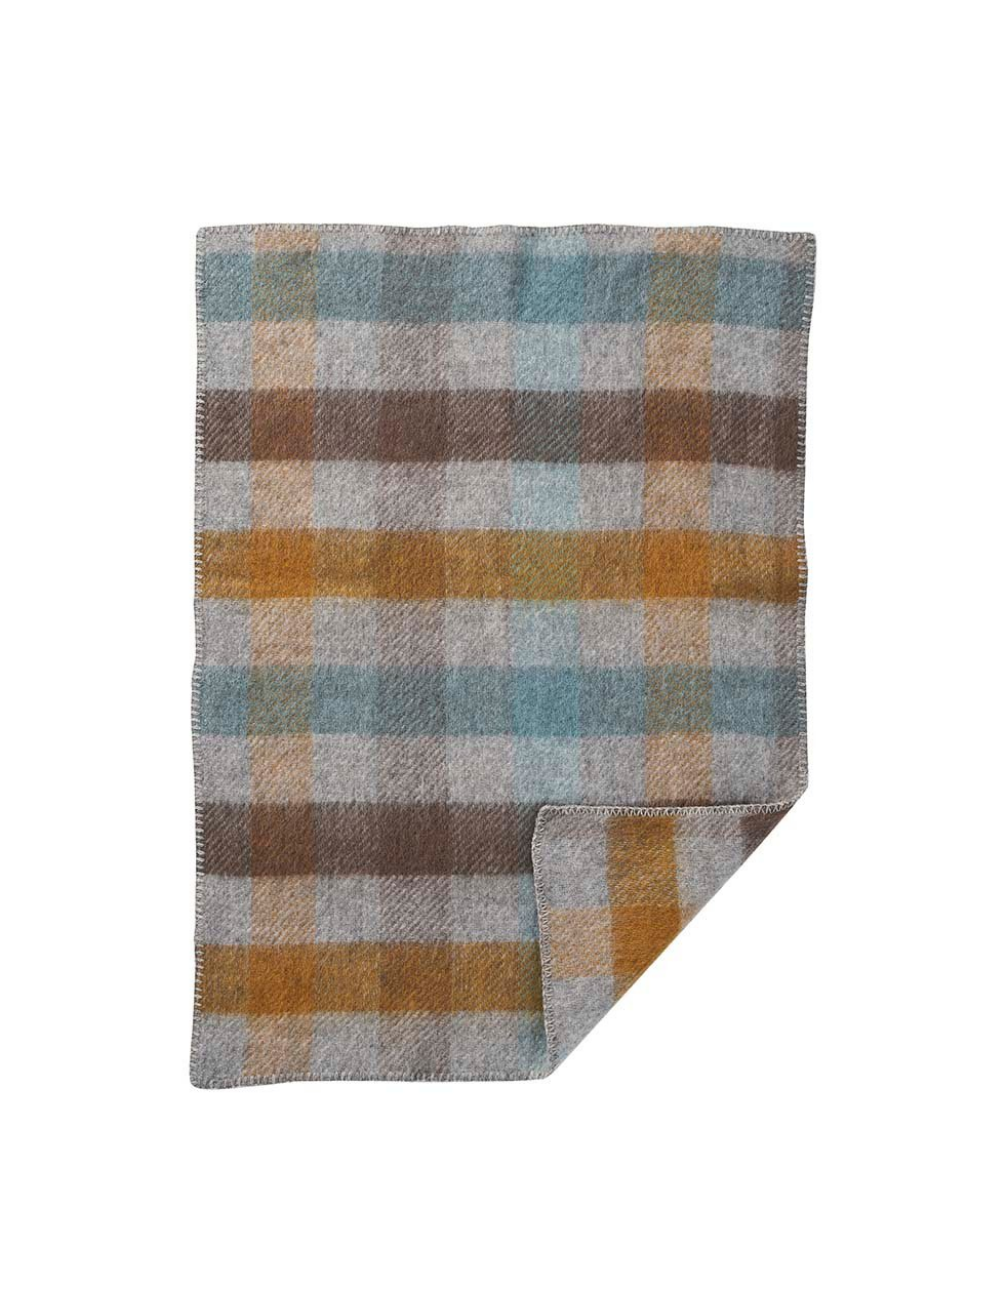 Gotland Baby Multi Turqouise Wool Blanket